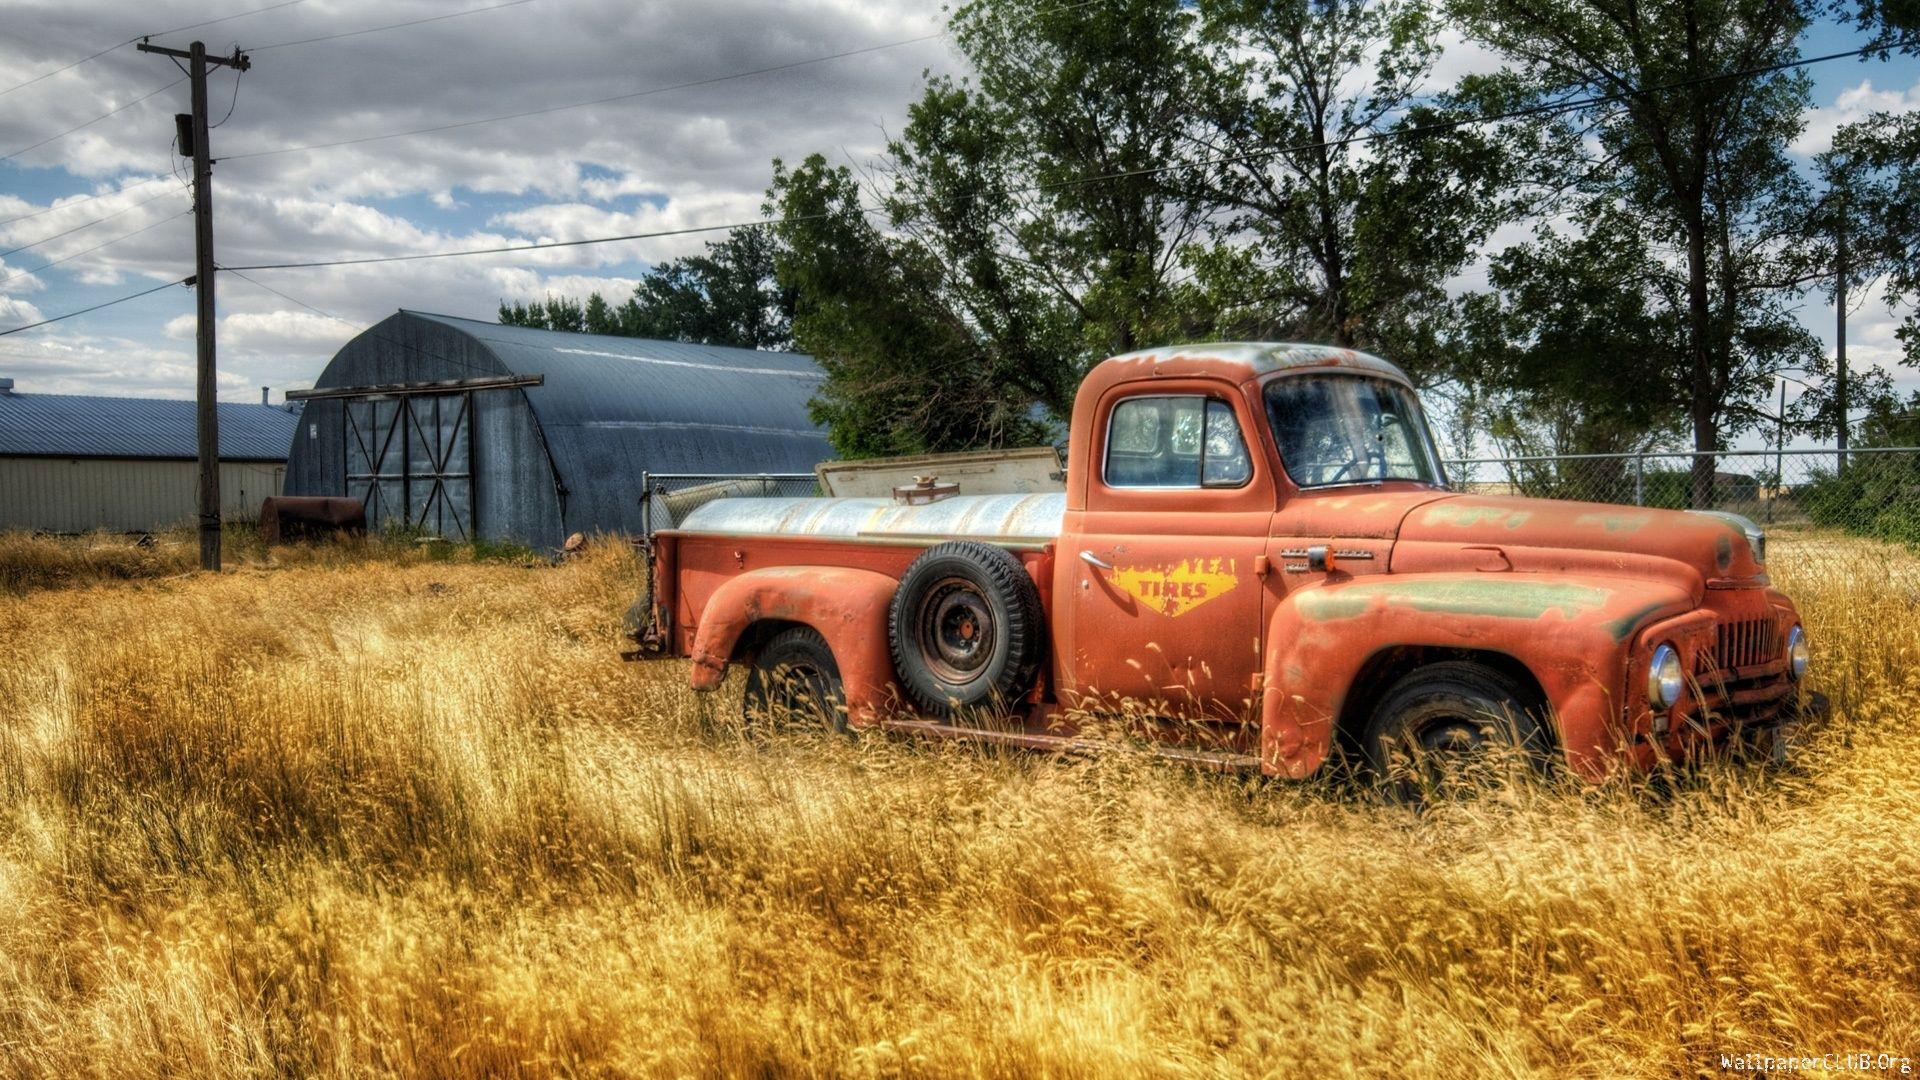 vintage trucks | Old Rusty Orange Vintage Pickup Truck Against Blue ...